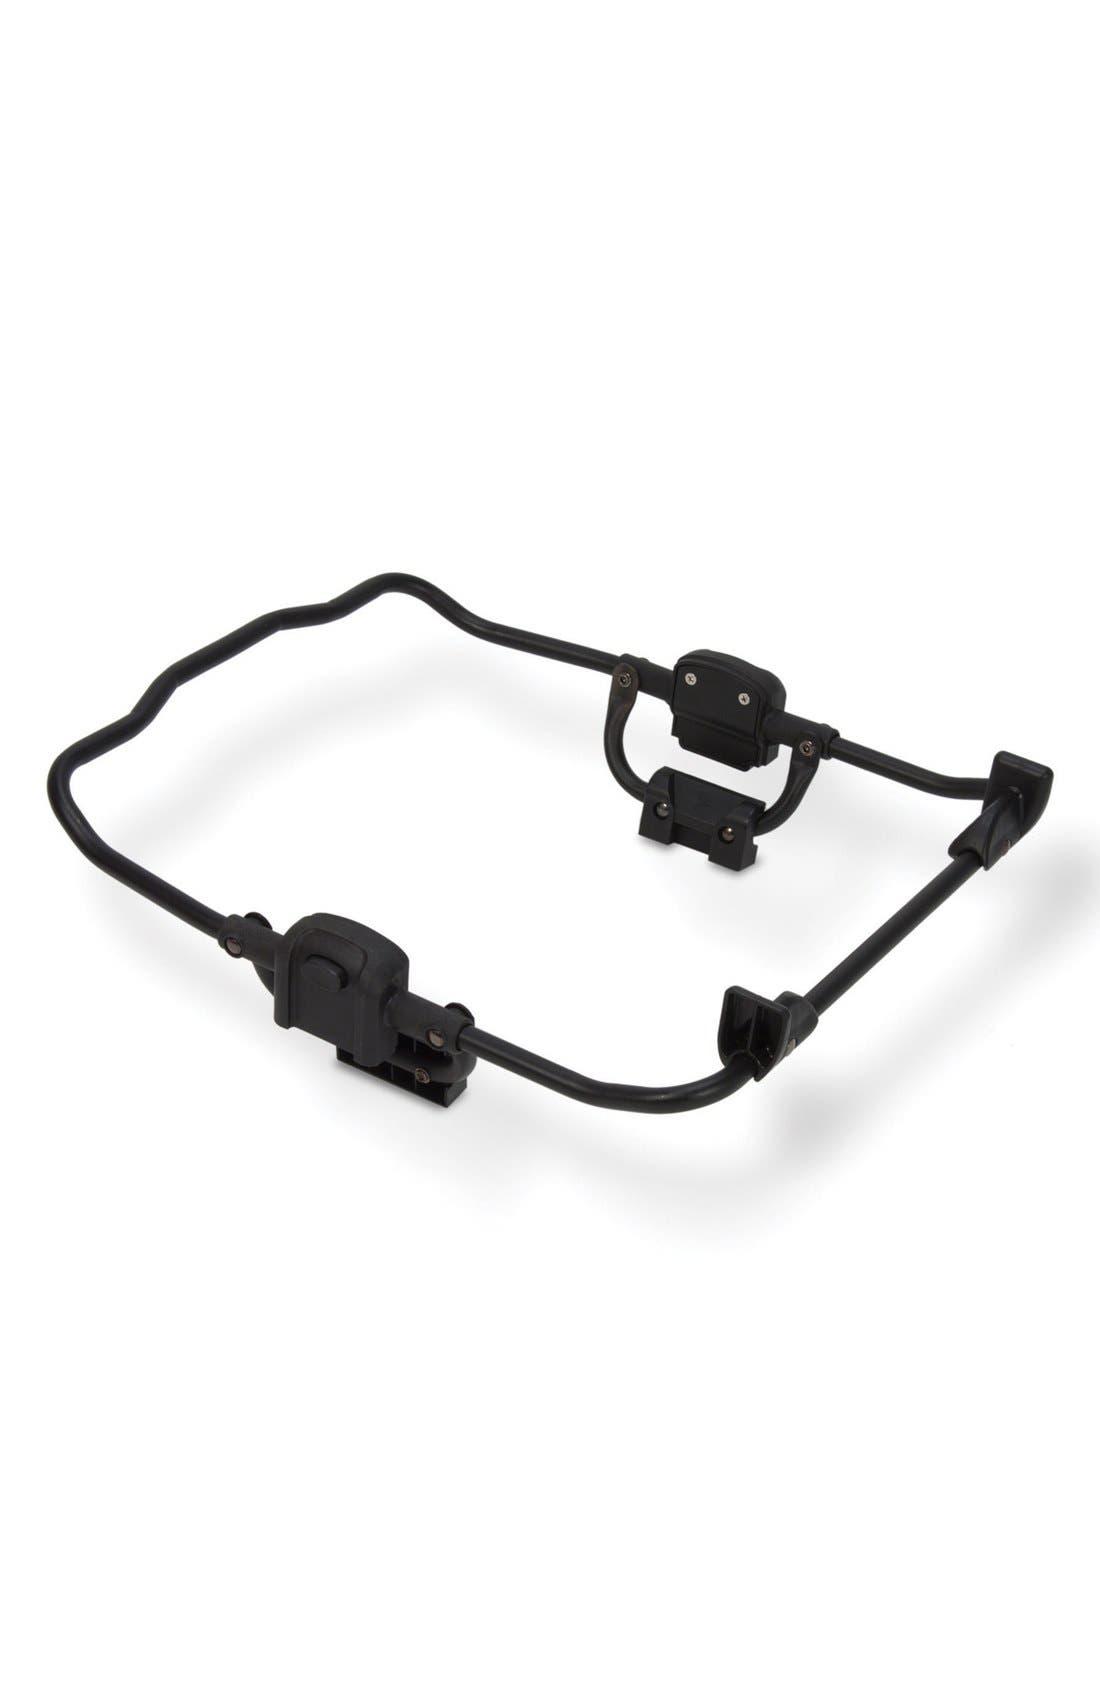 Main Image - UPPAbaby VISTA & CRUZ Stroller to Chicco® Car Seat Adapter